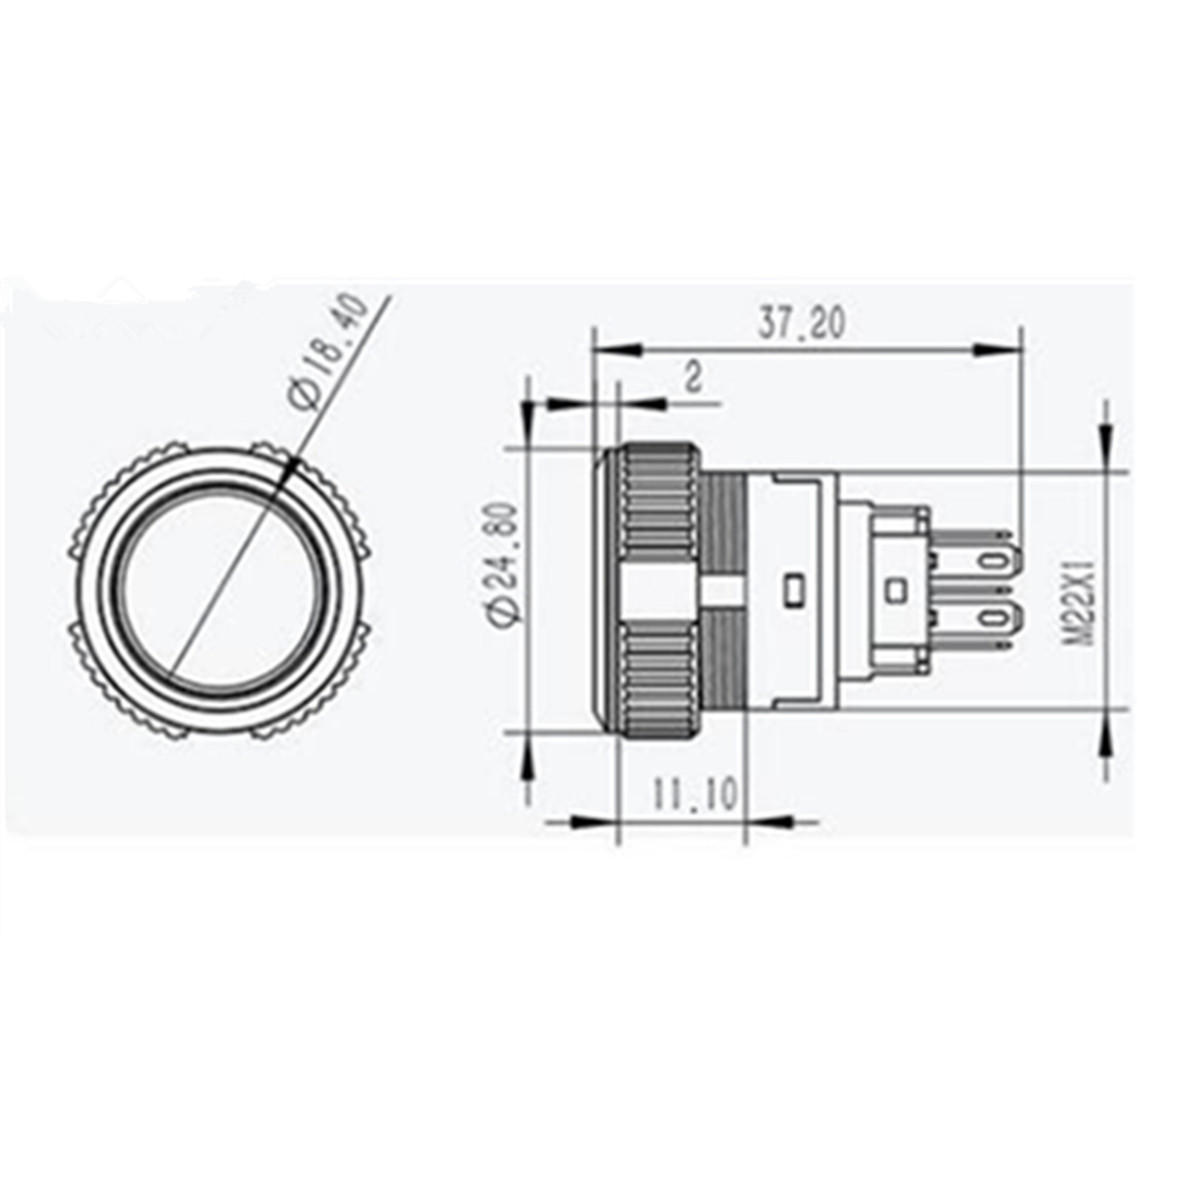 12v 5 Pin Led Push Button Switch Plastic Lamp Car Horn